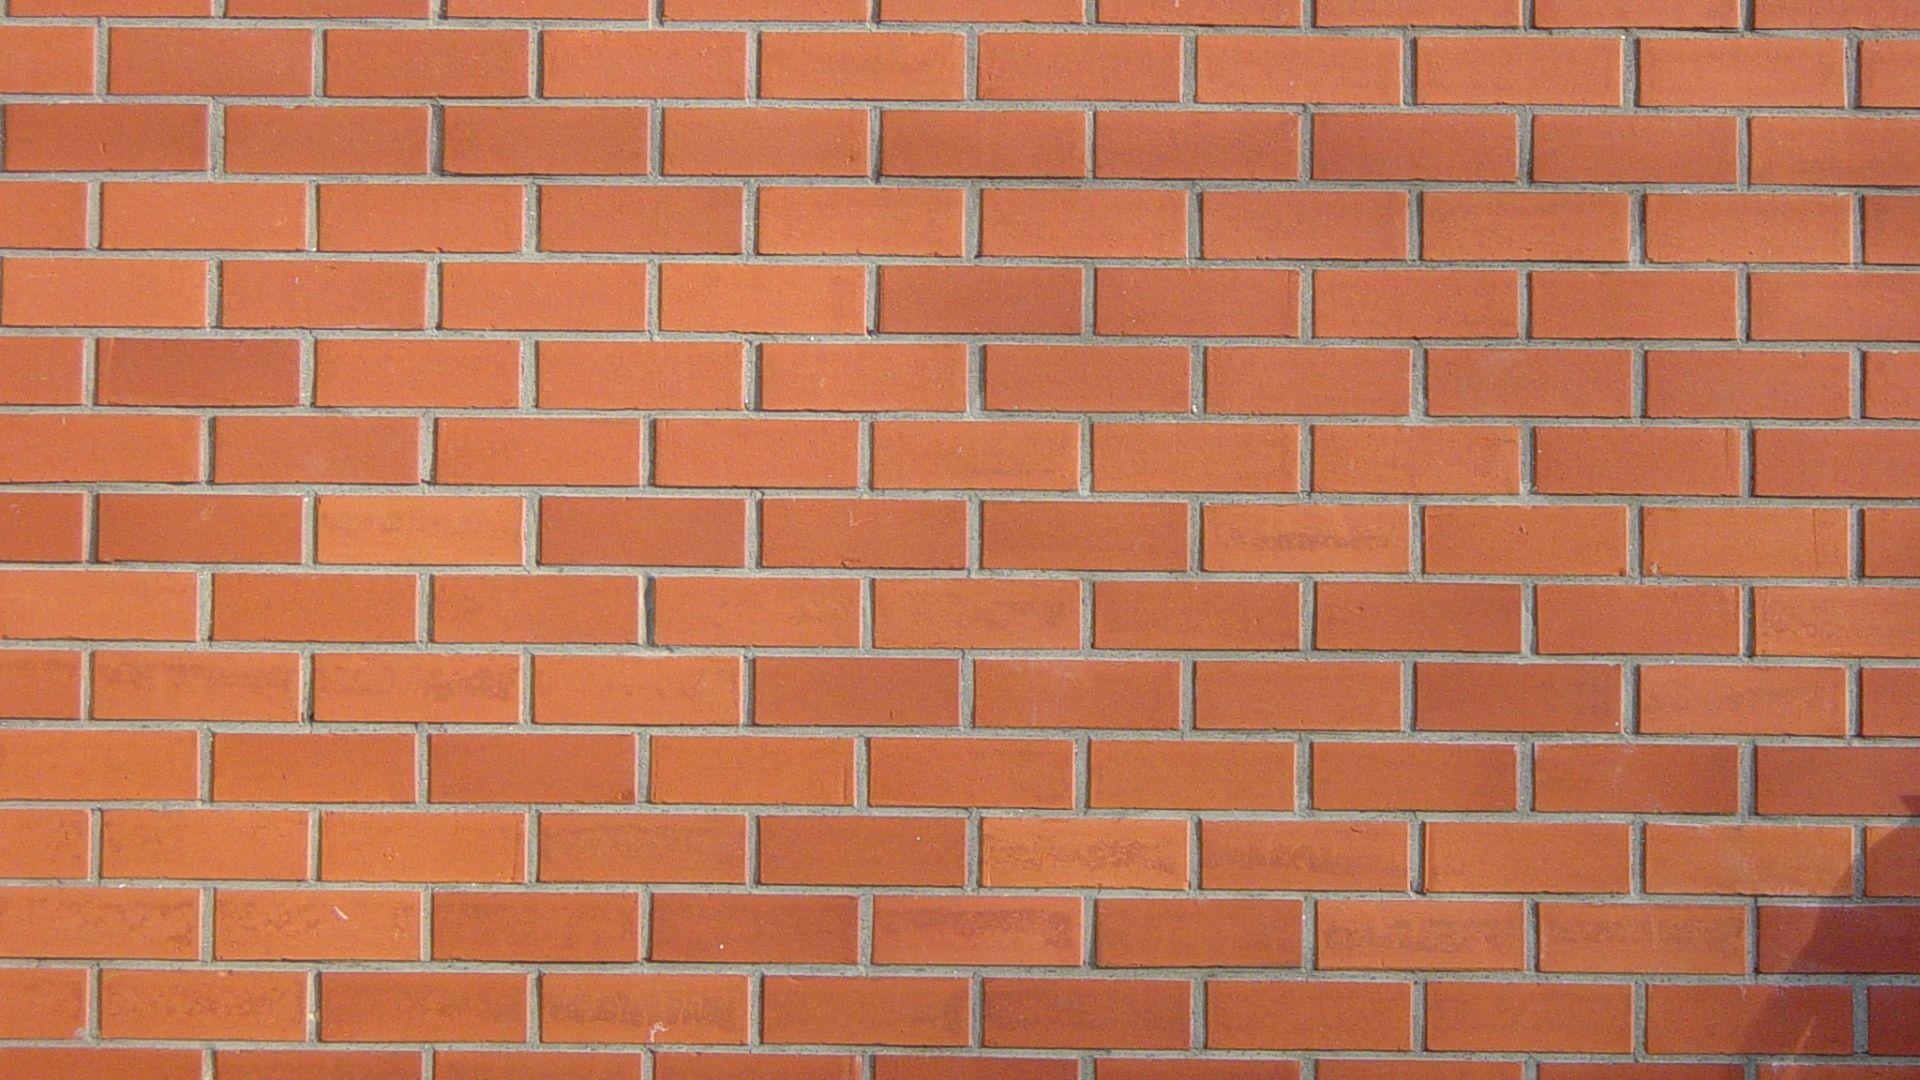 1920x1080 Wallpaper Texture Brick Wall Light Brick